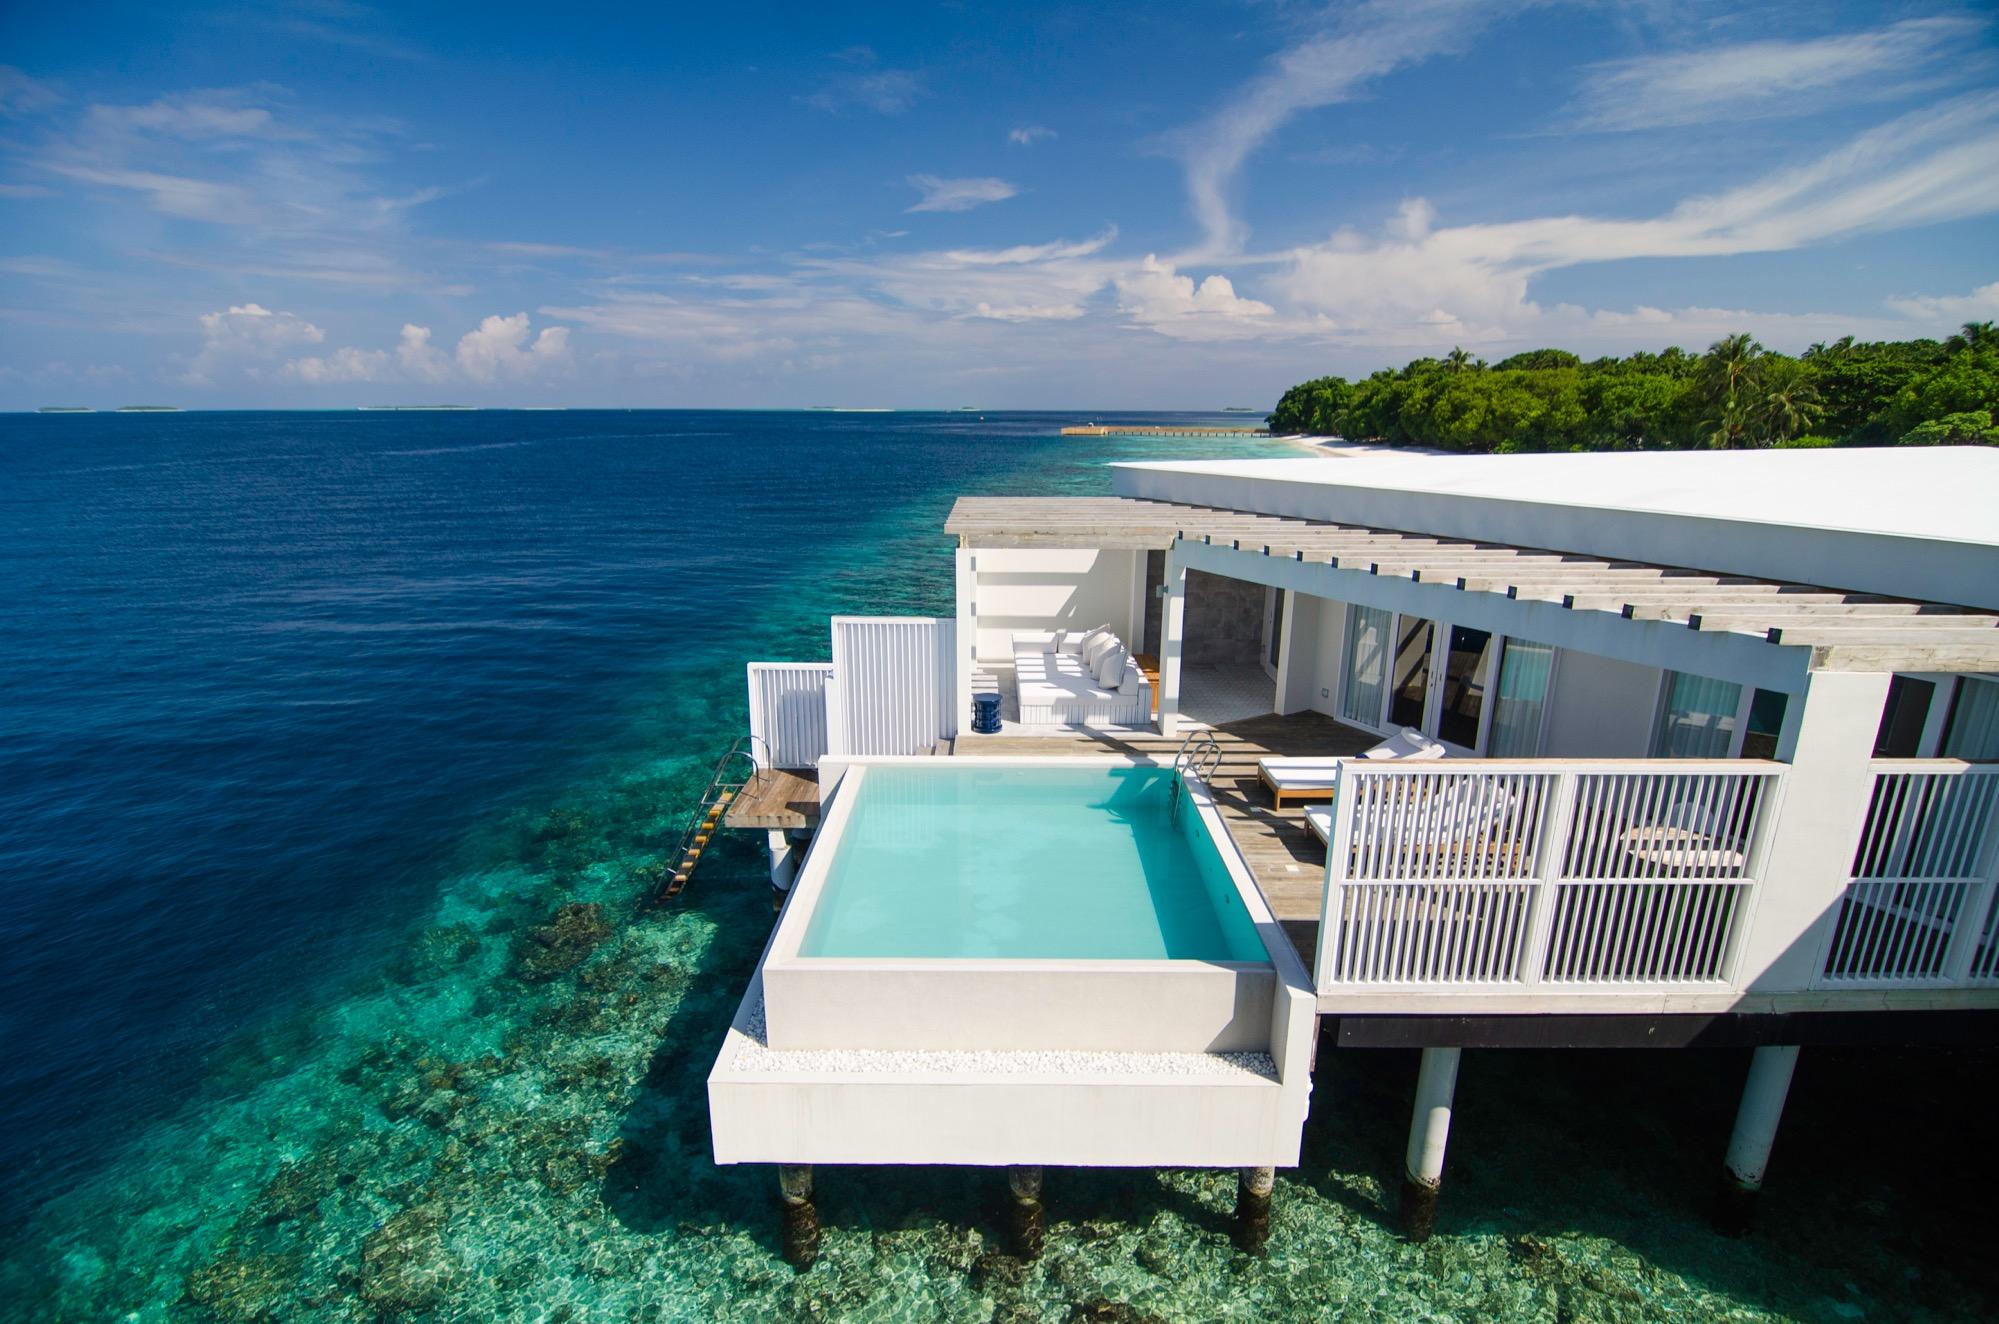 Fangokur: Foto vom Wellnesshotel Amilla Maldives Resort & Residences | Wellness Baa Atoll